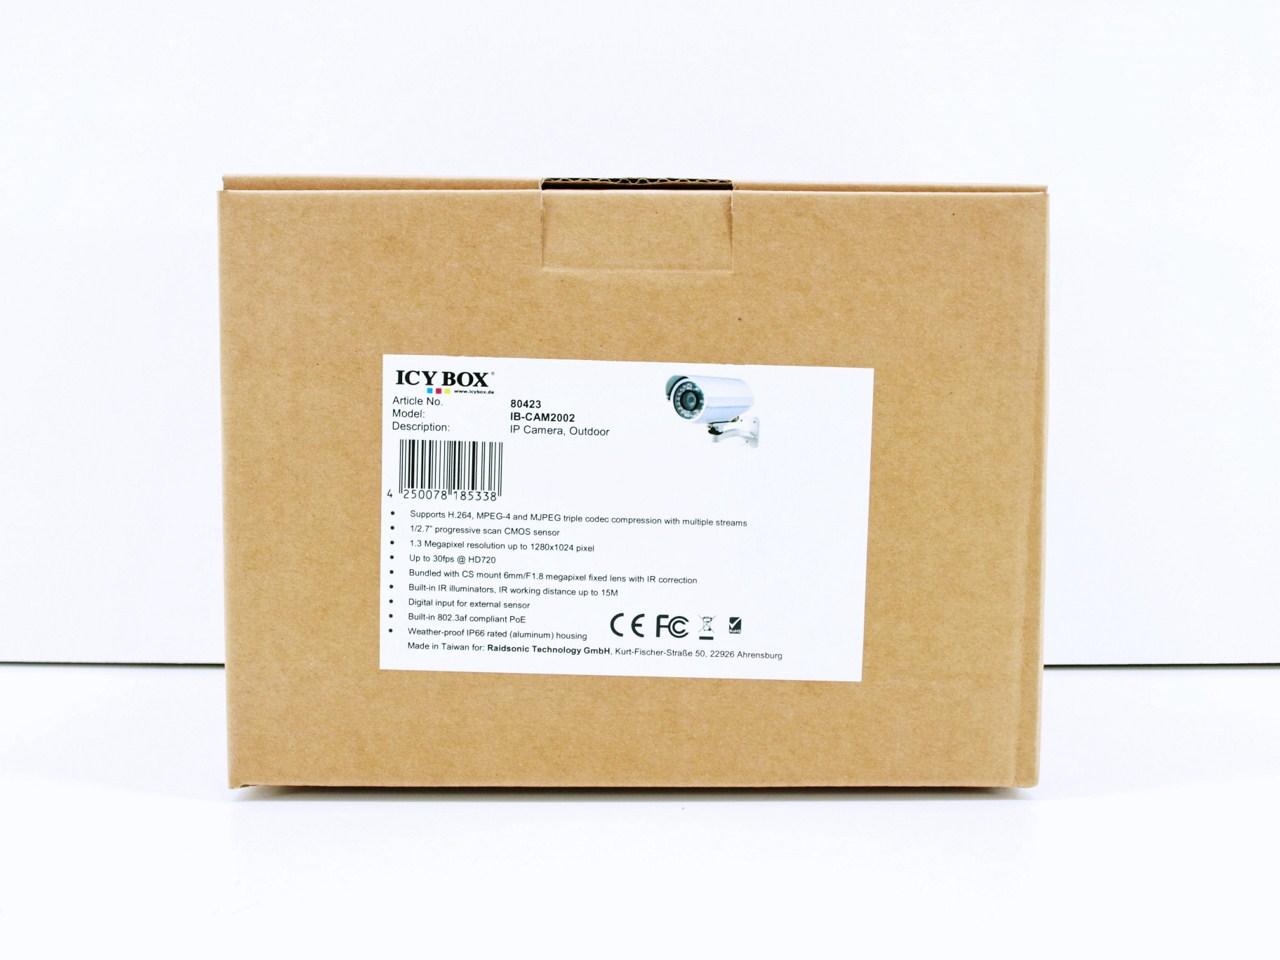 RaidSonic ICY BOX IB-CAM2002 1.3MP Outdoor IP Camera Review